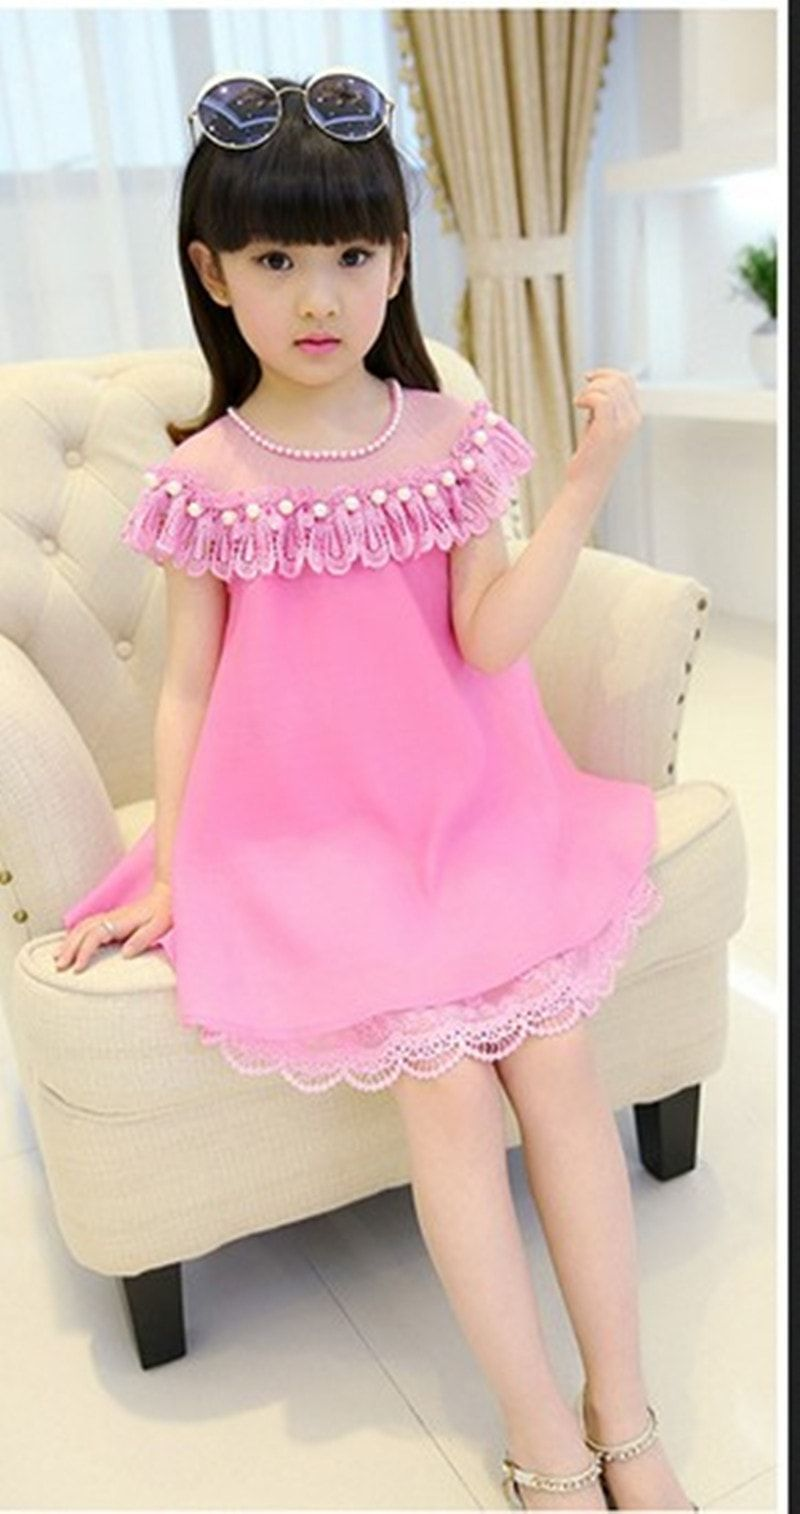 new dress for girl 2019 new fashion dress for girl 2019 new style dress for  girl 2019 c5b3e4cf1dfd